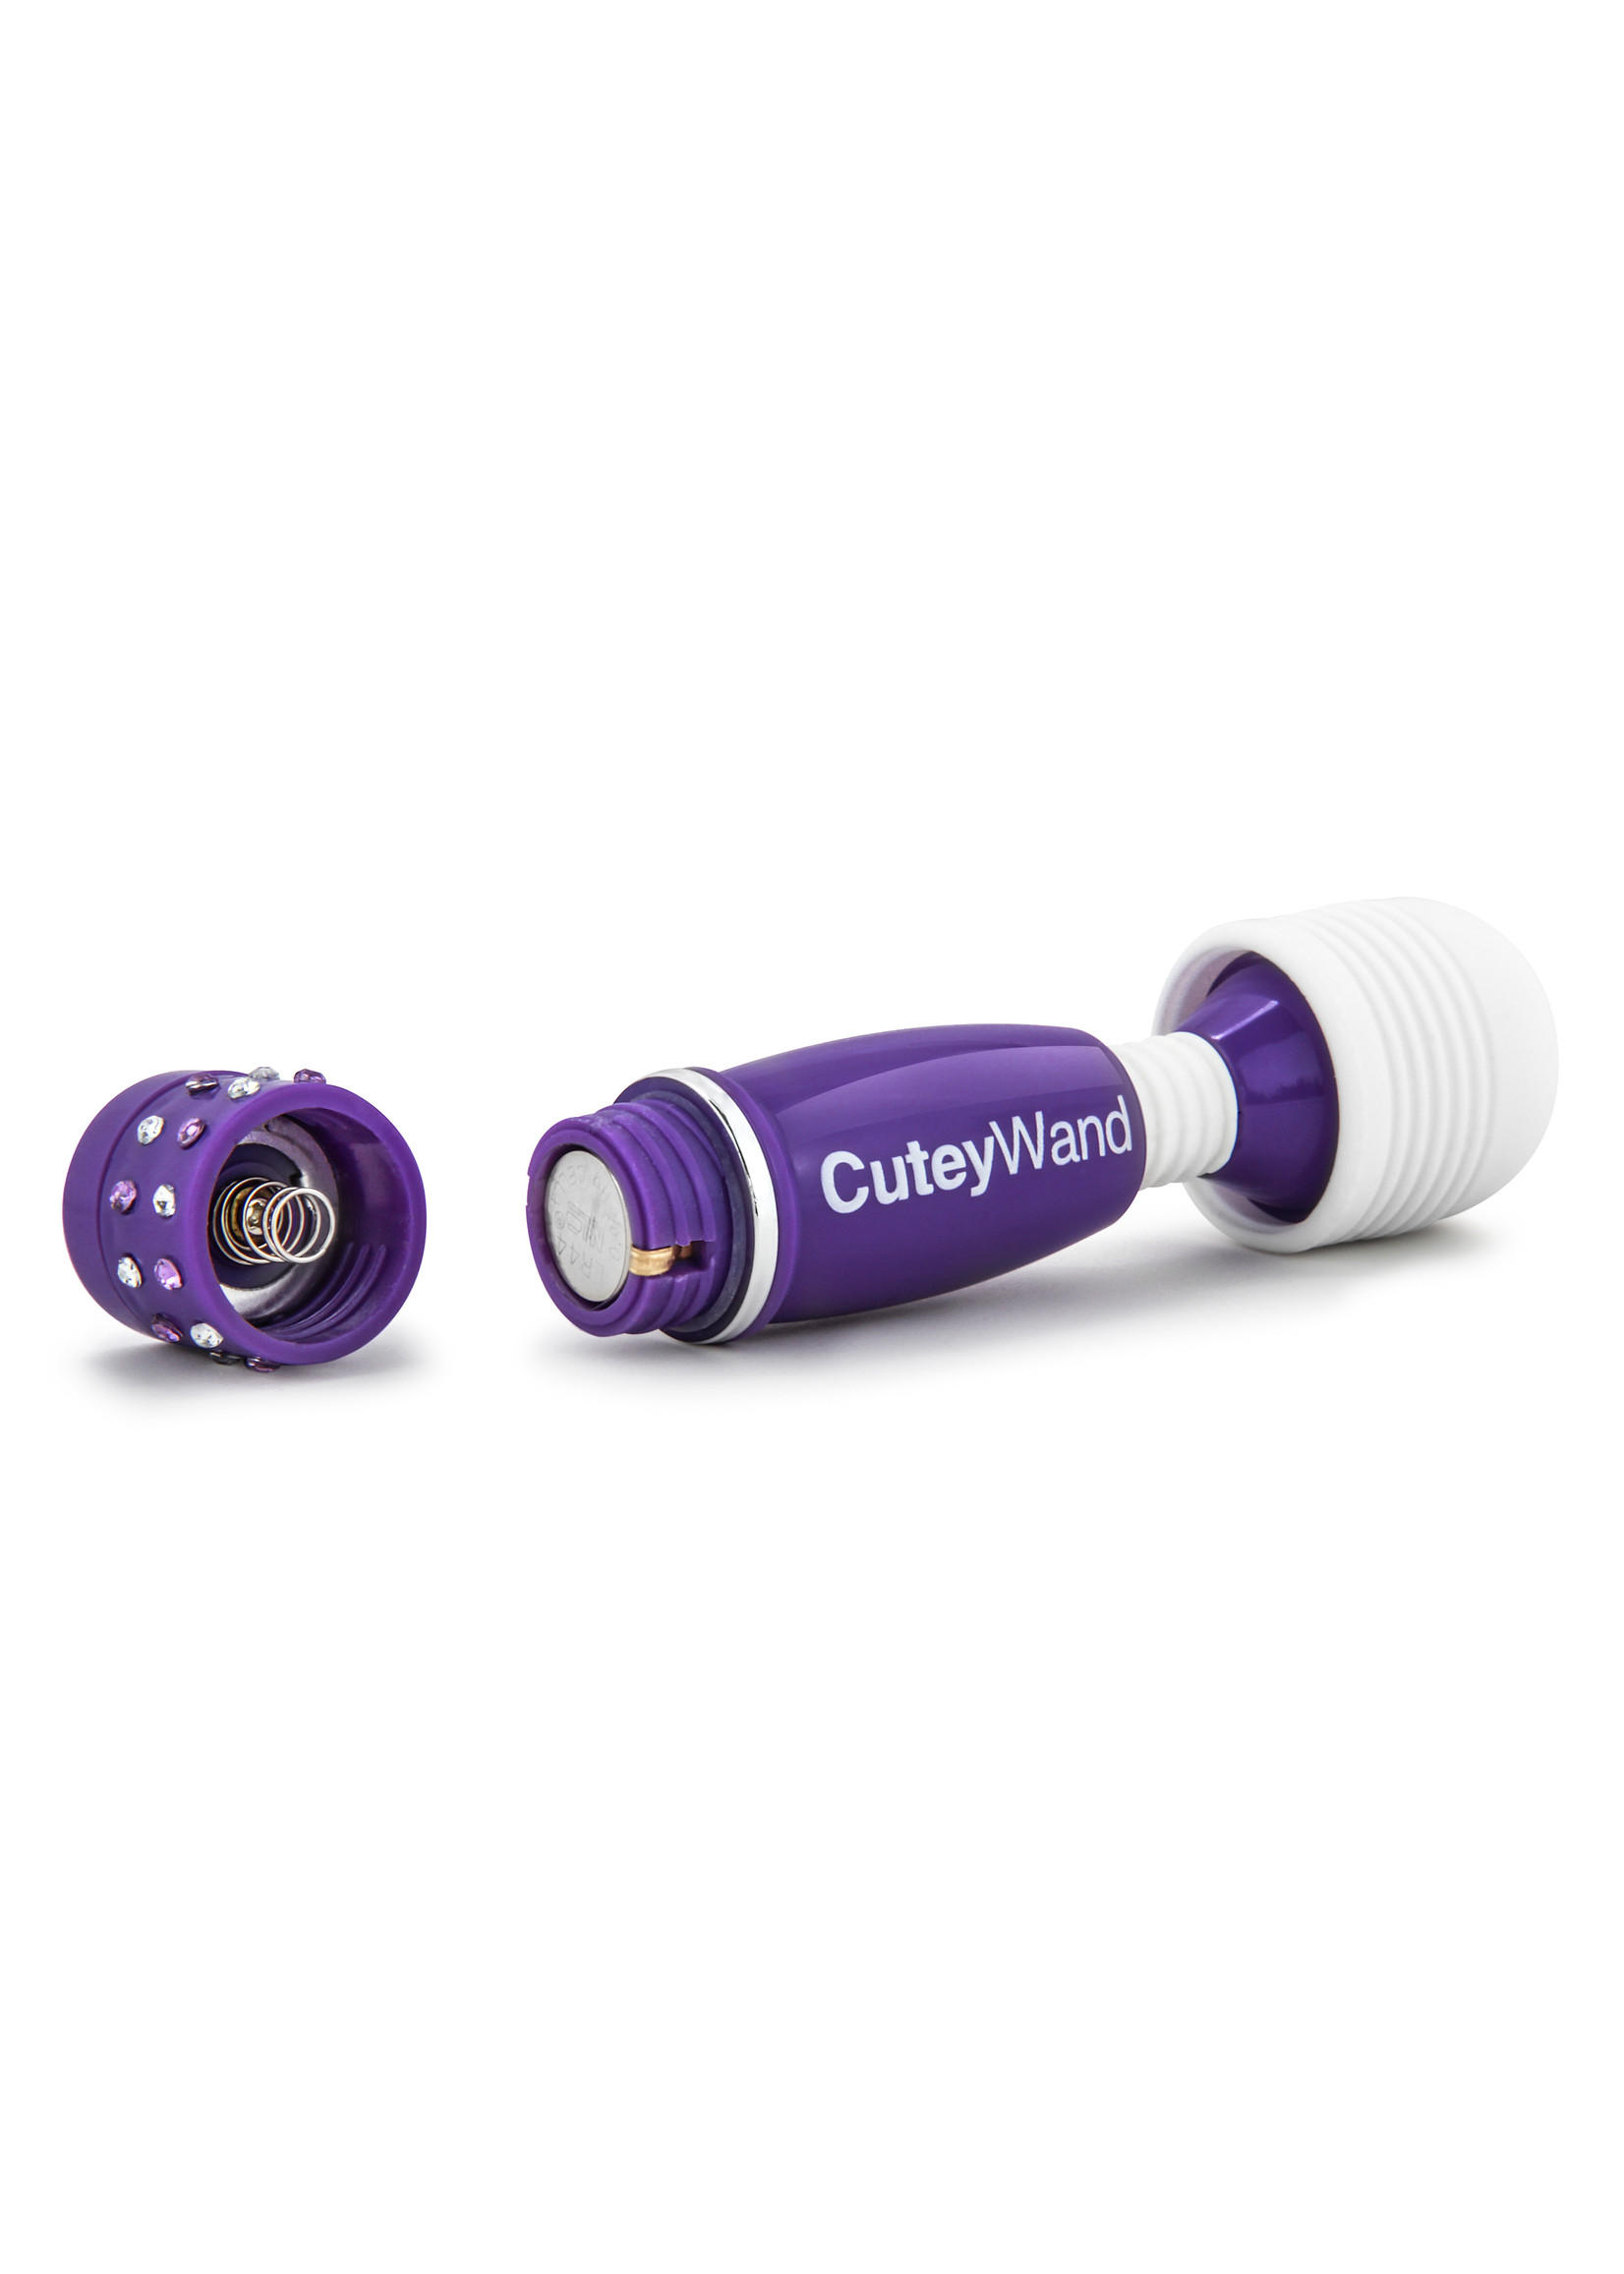 Blush Novelties Play with Me - Cutey Wand - Purple